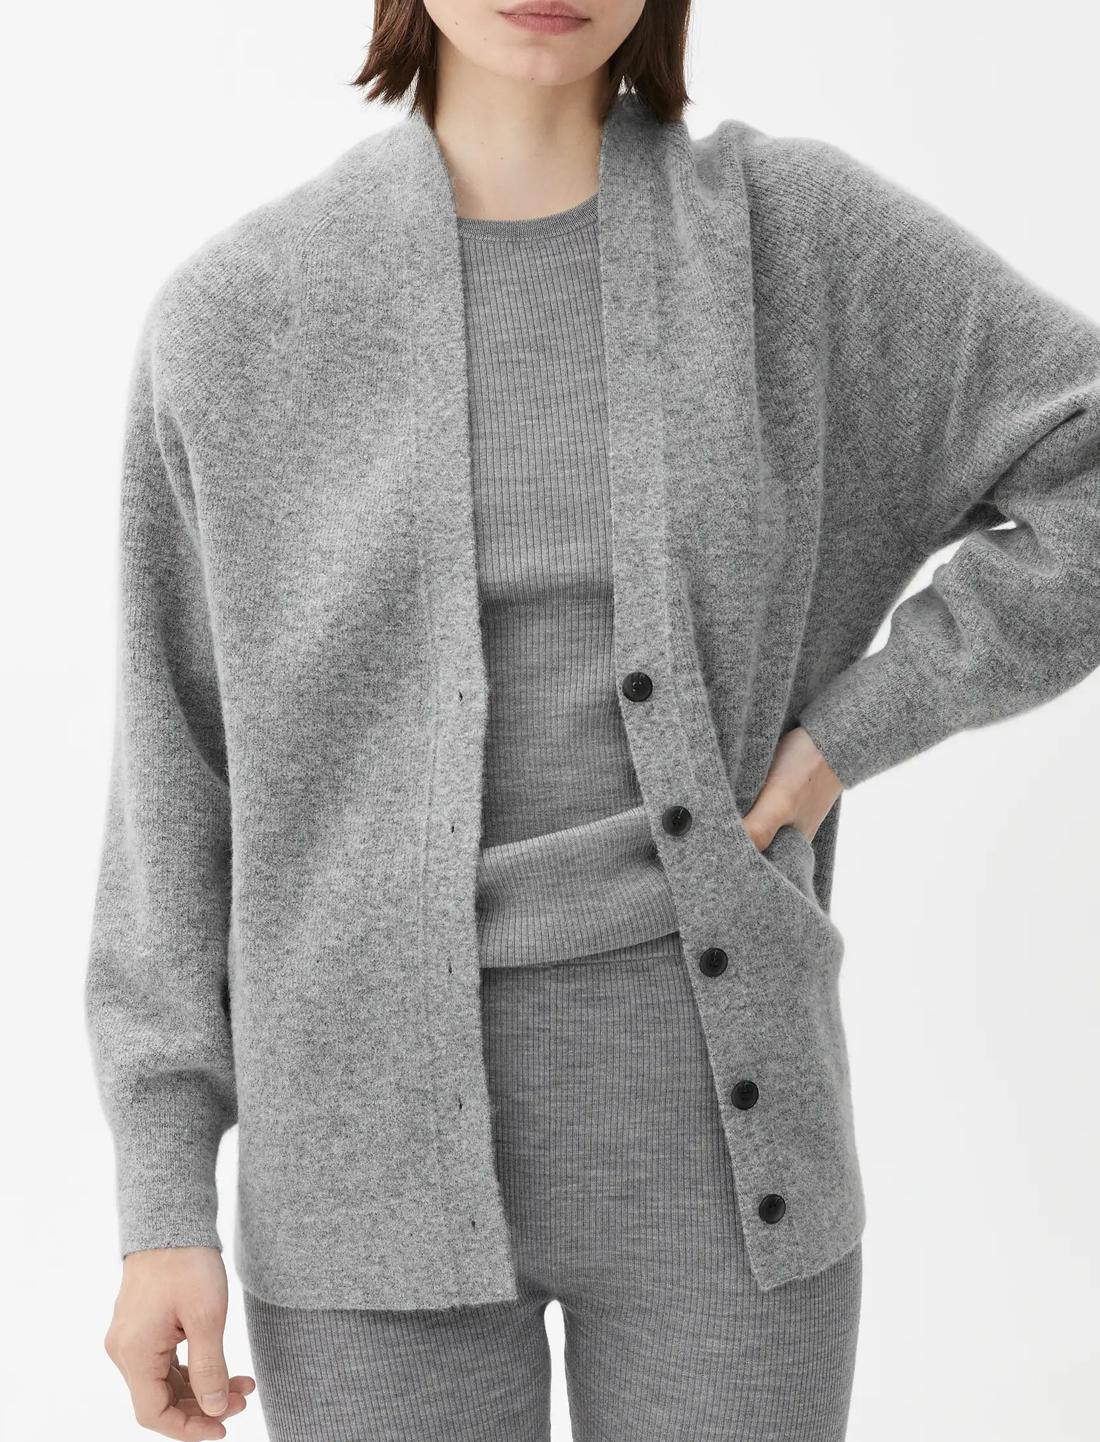 grey alpaca blend cardigan